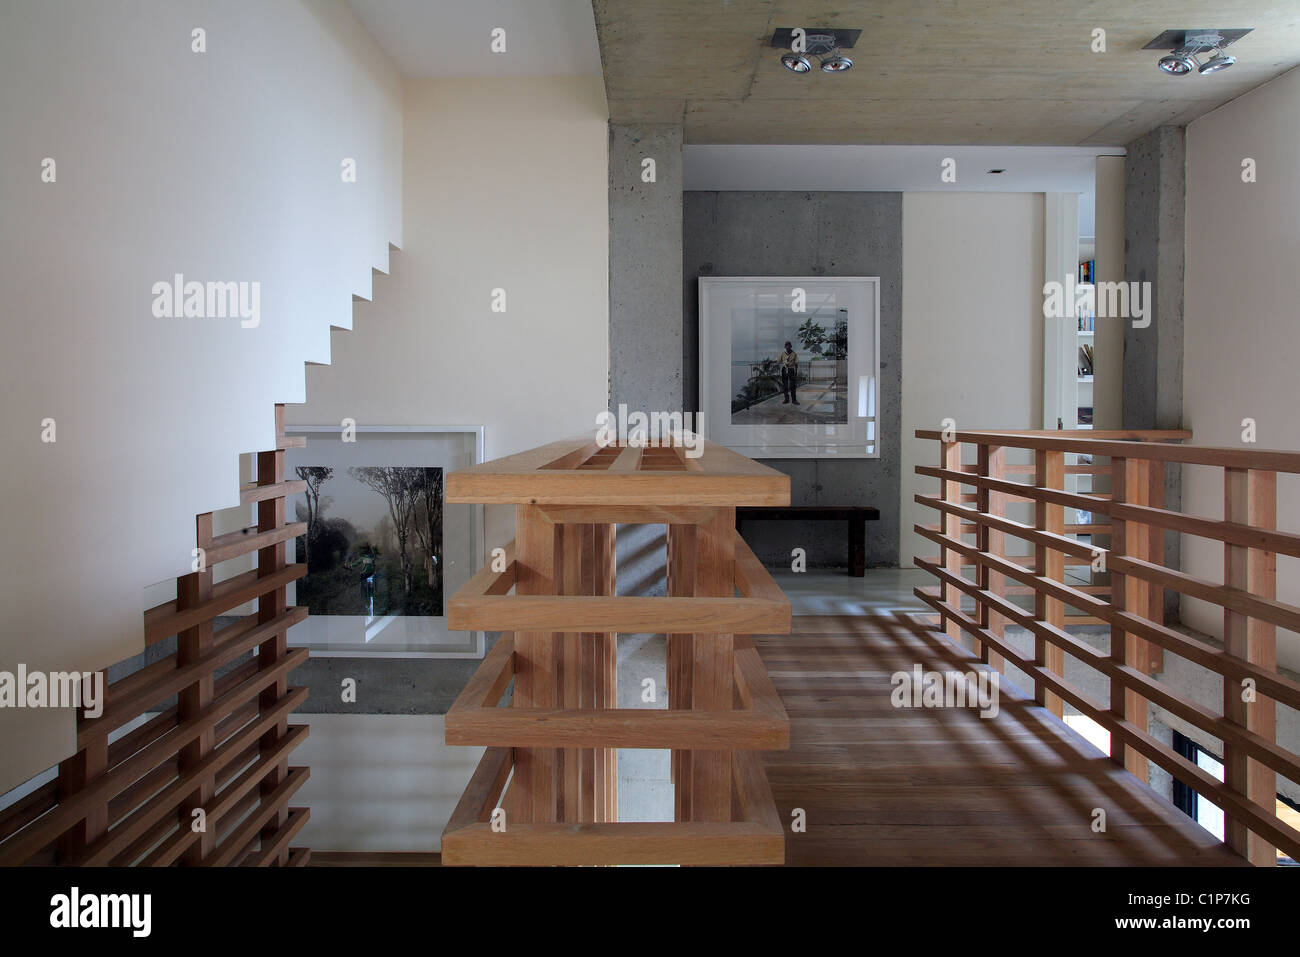 Südafrika, Kapstadt, Camps Bay, Interieur eines Architekten-Haus Stockbild